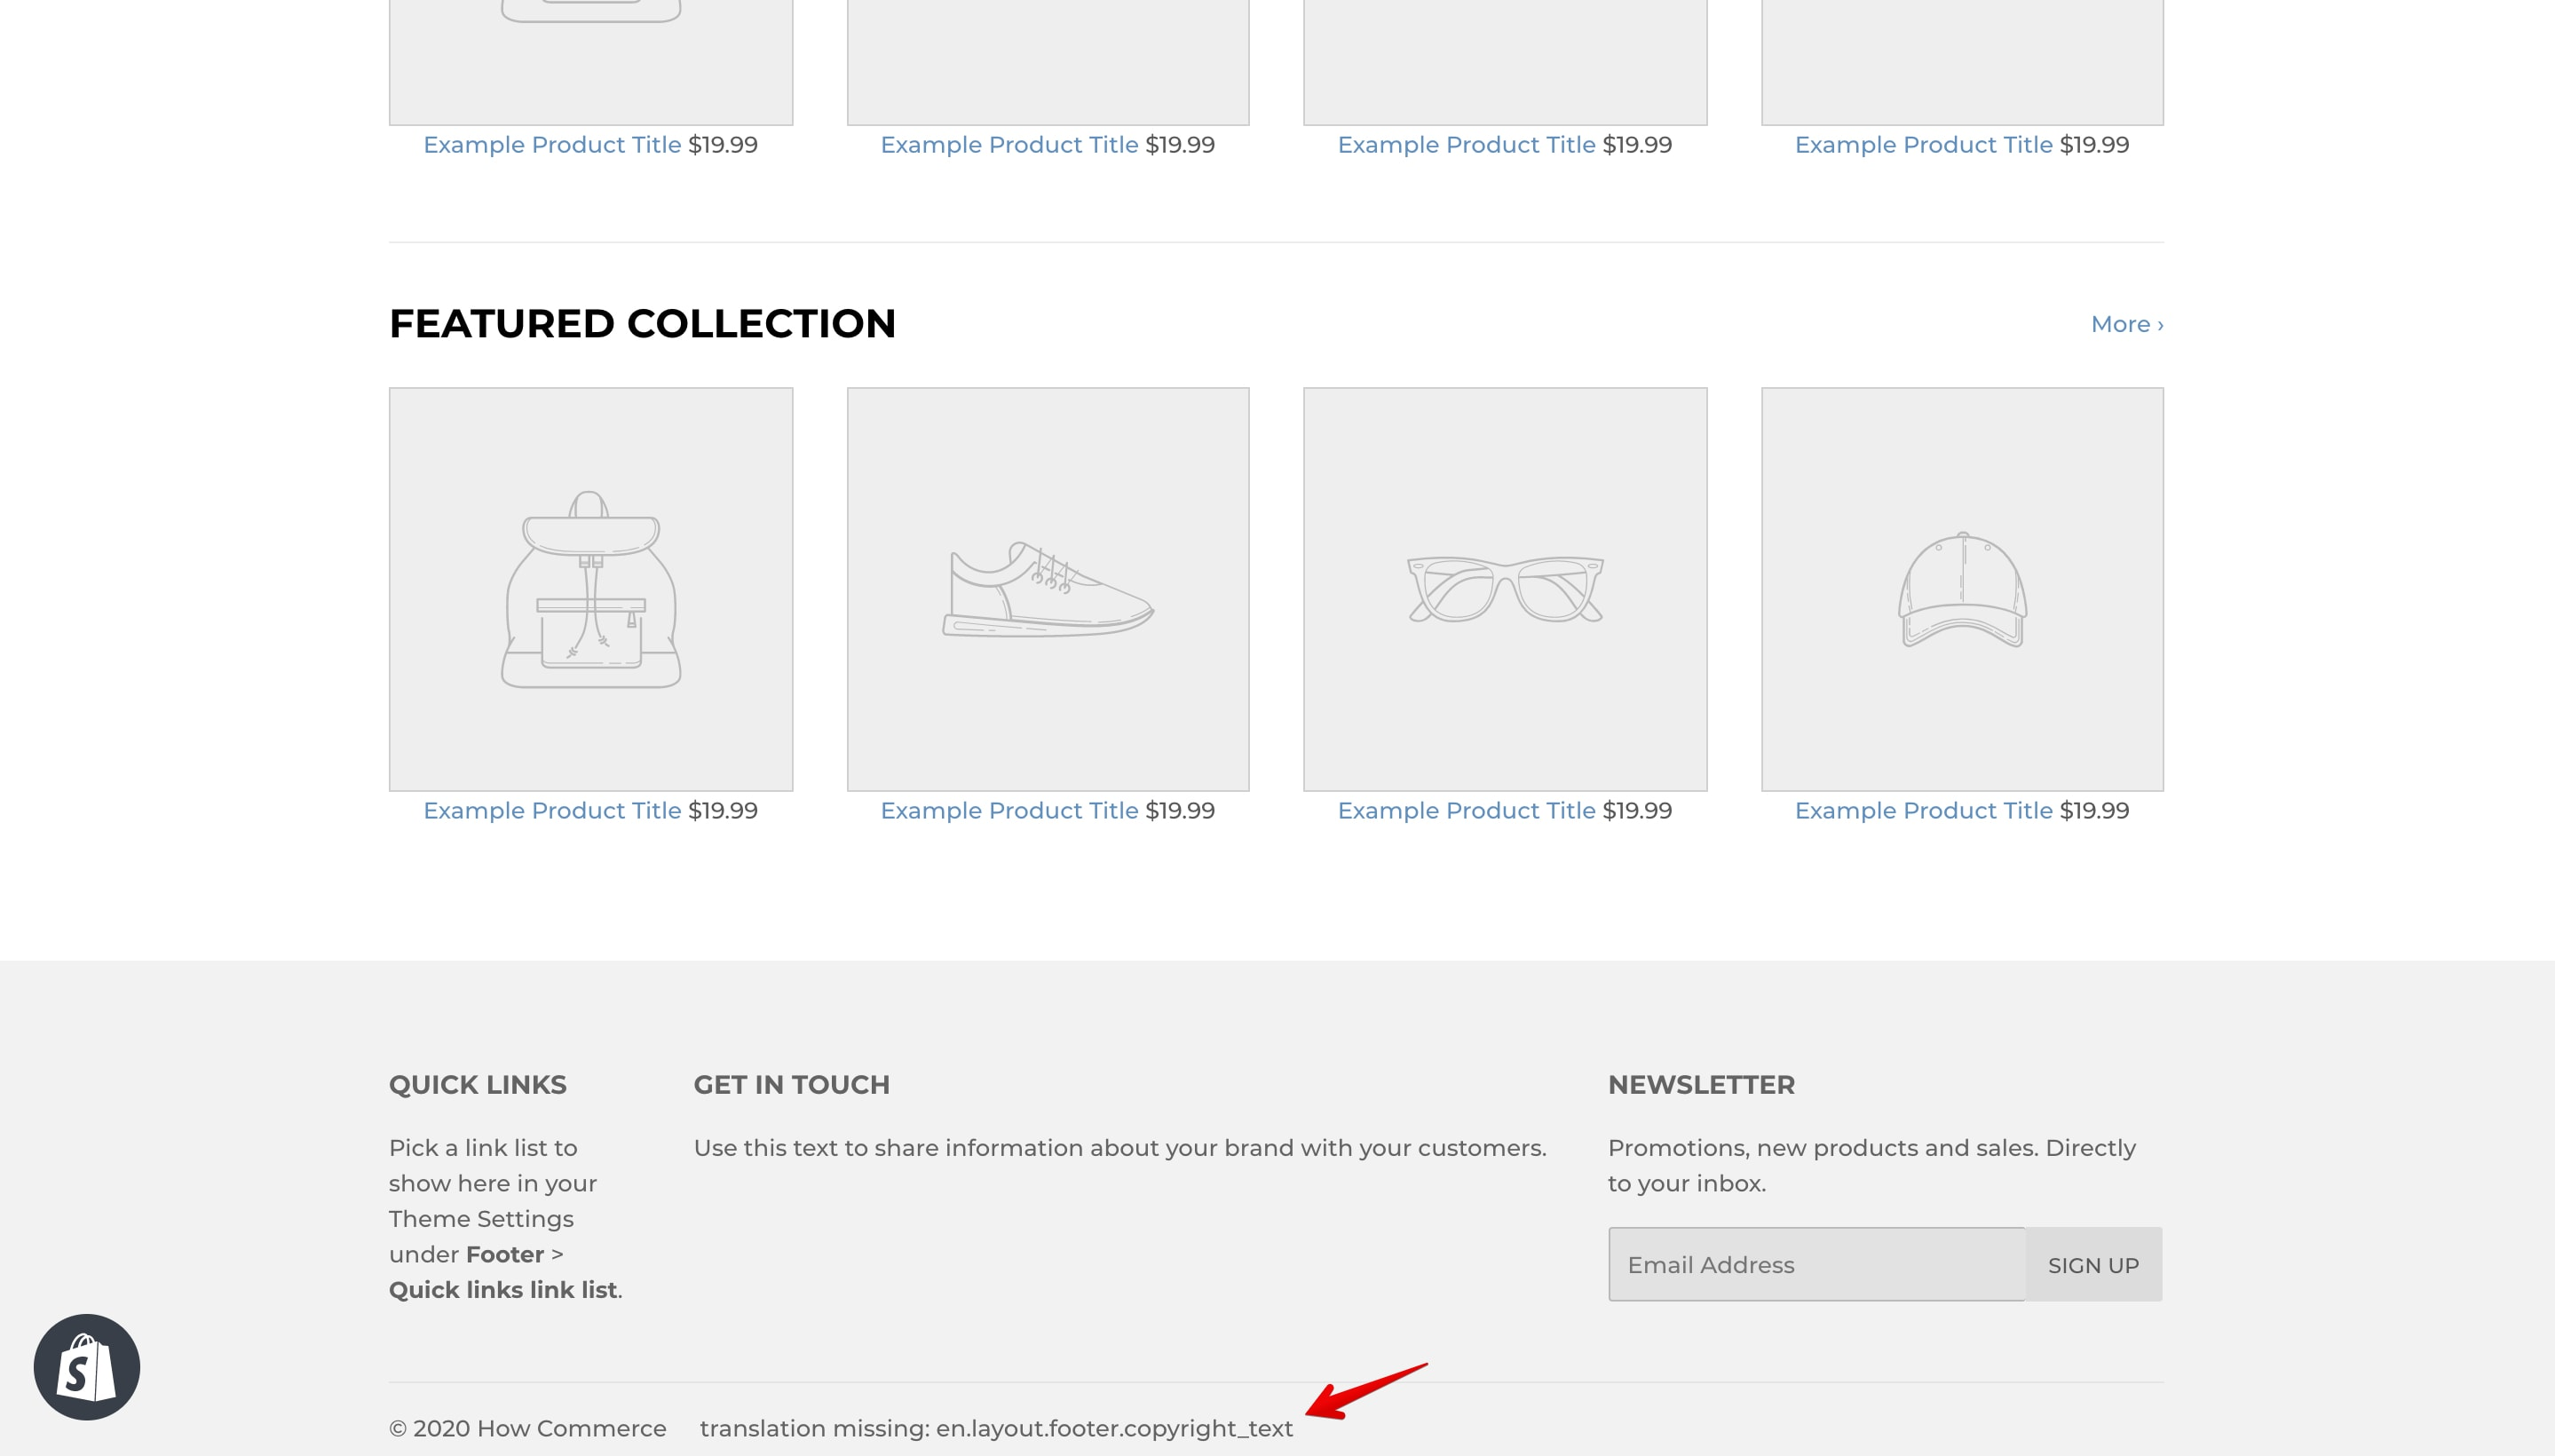 Supply theme new copyright code error.